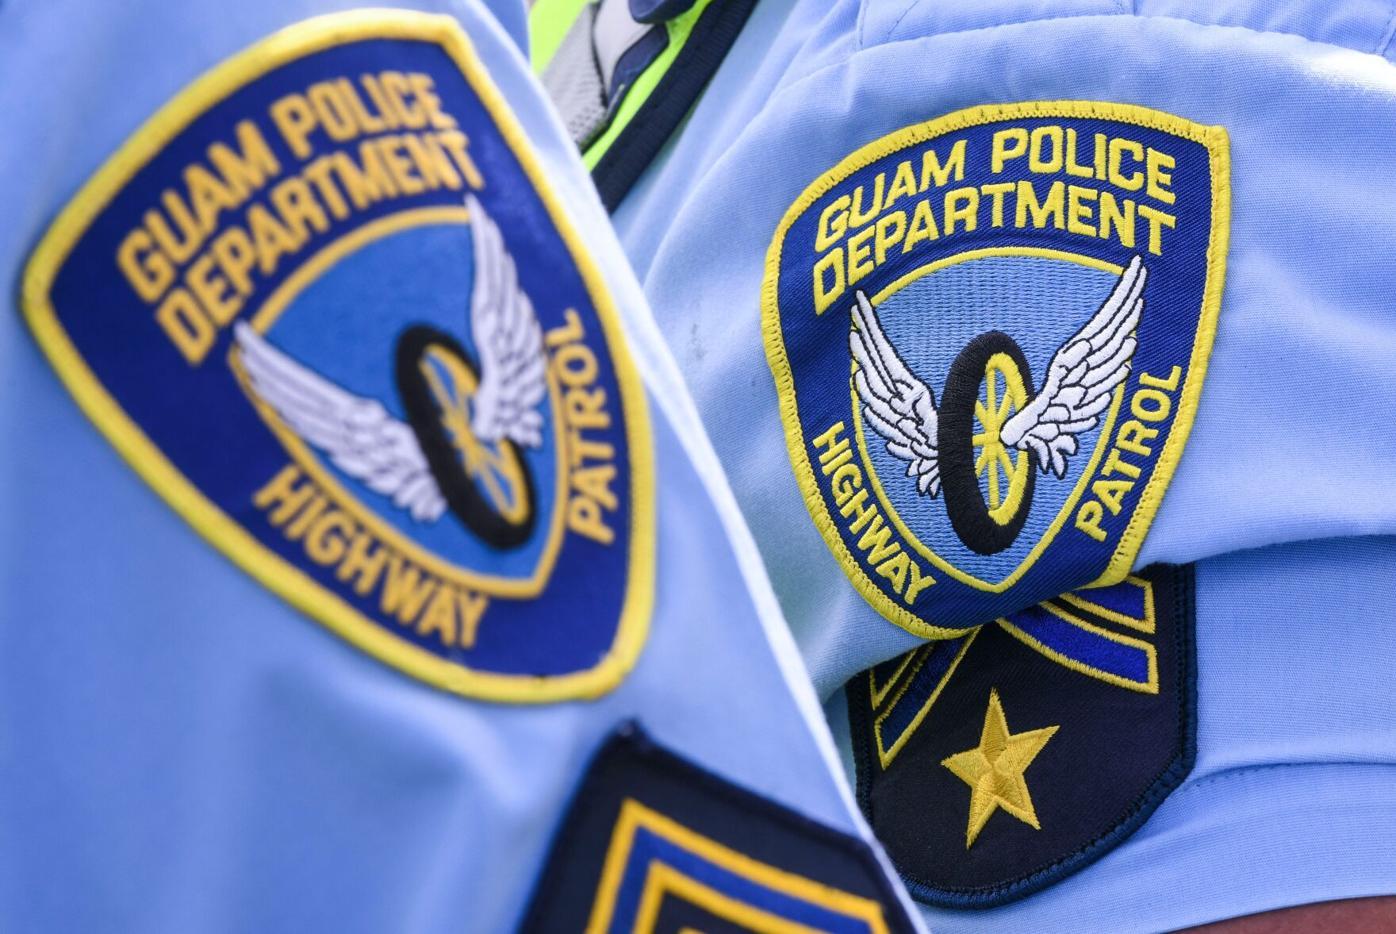 GPD Highway Patrol STOCK IMAGE